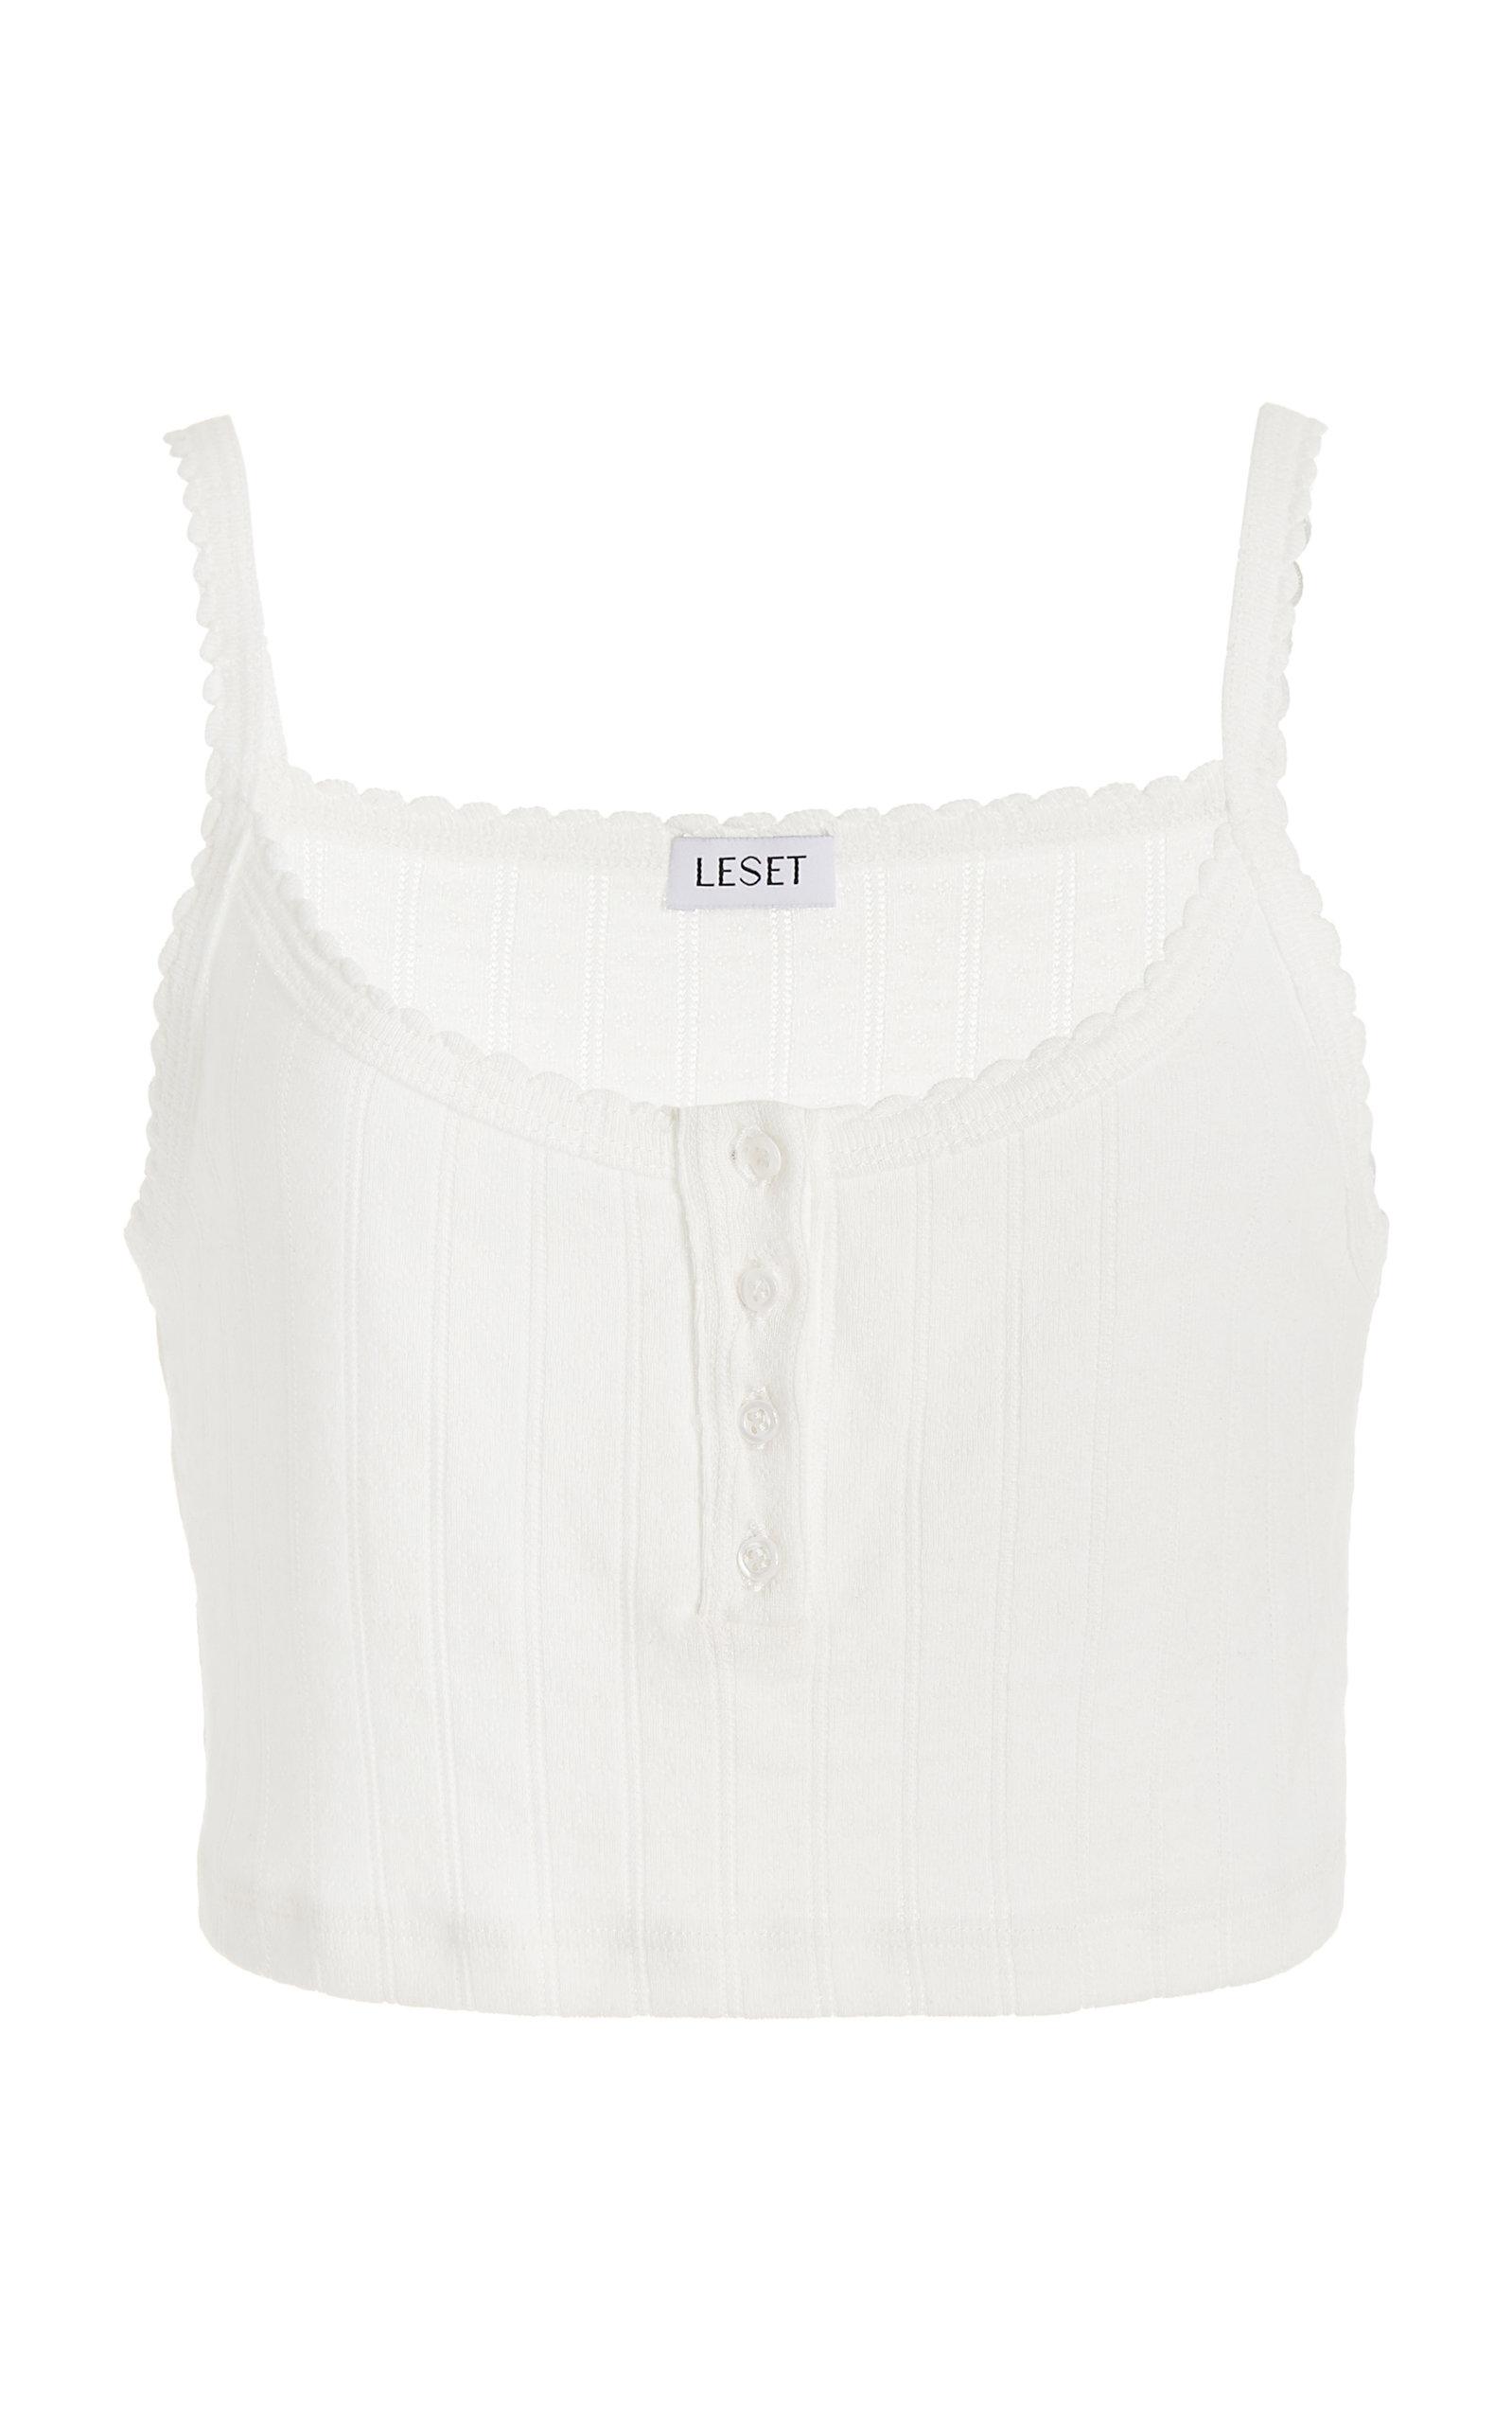 Women's Scoop Neck Cropped Cotton Tank Top